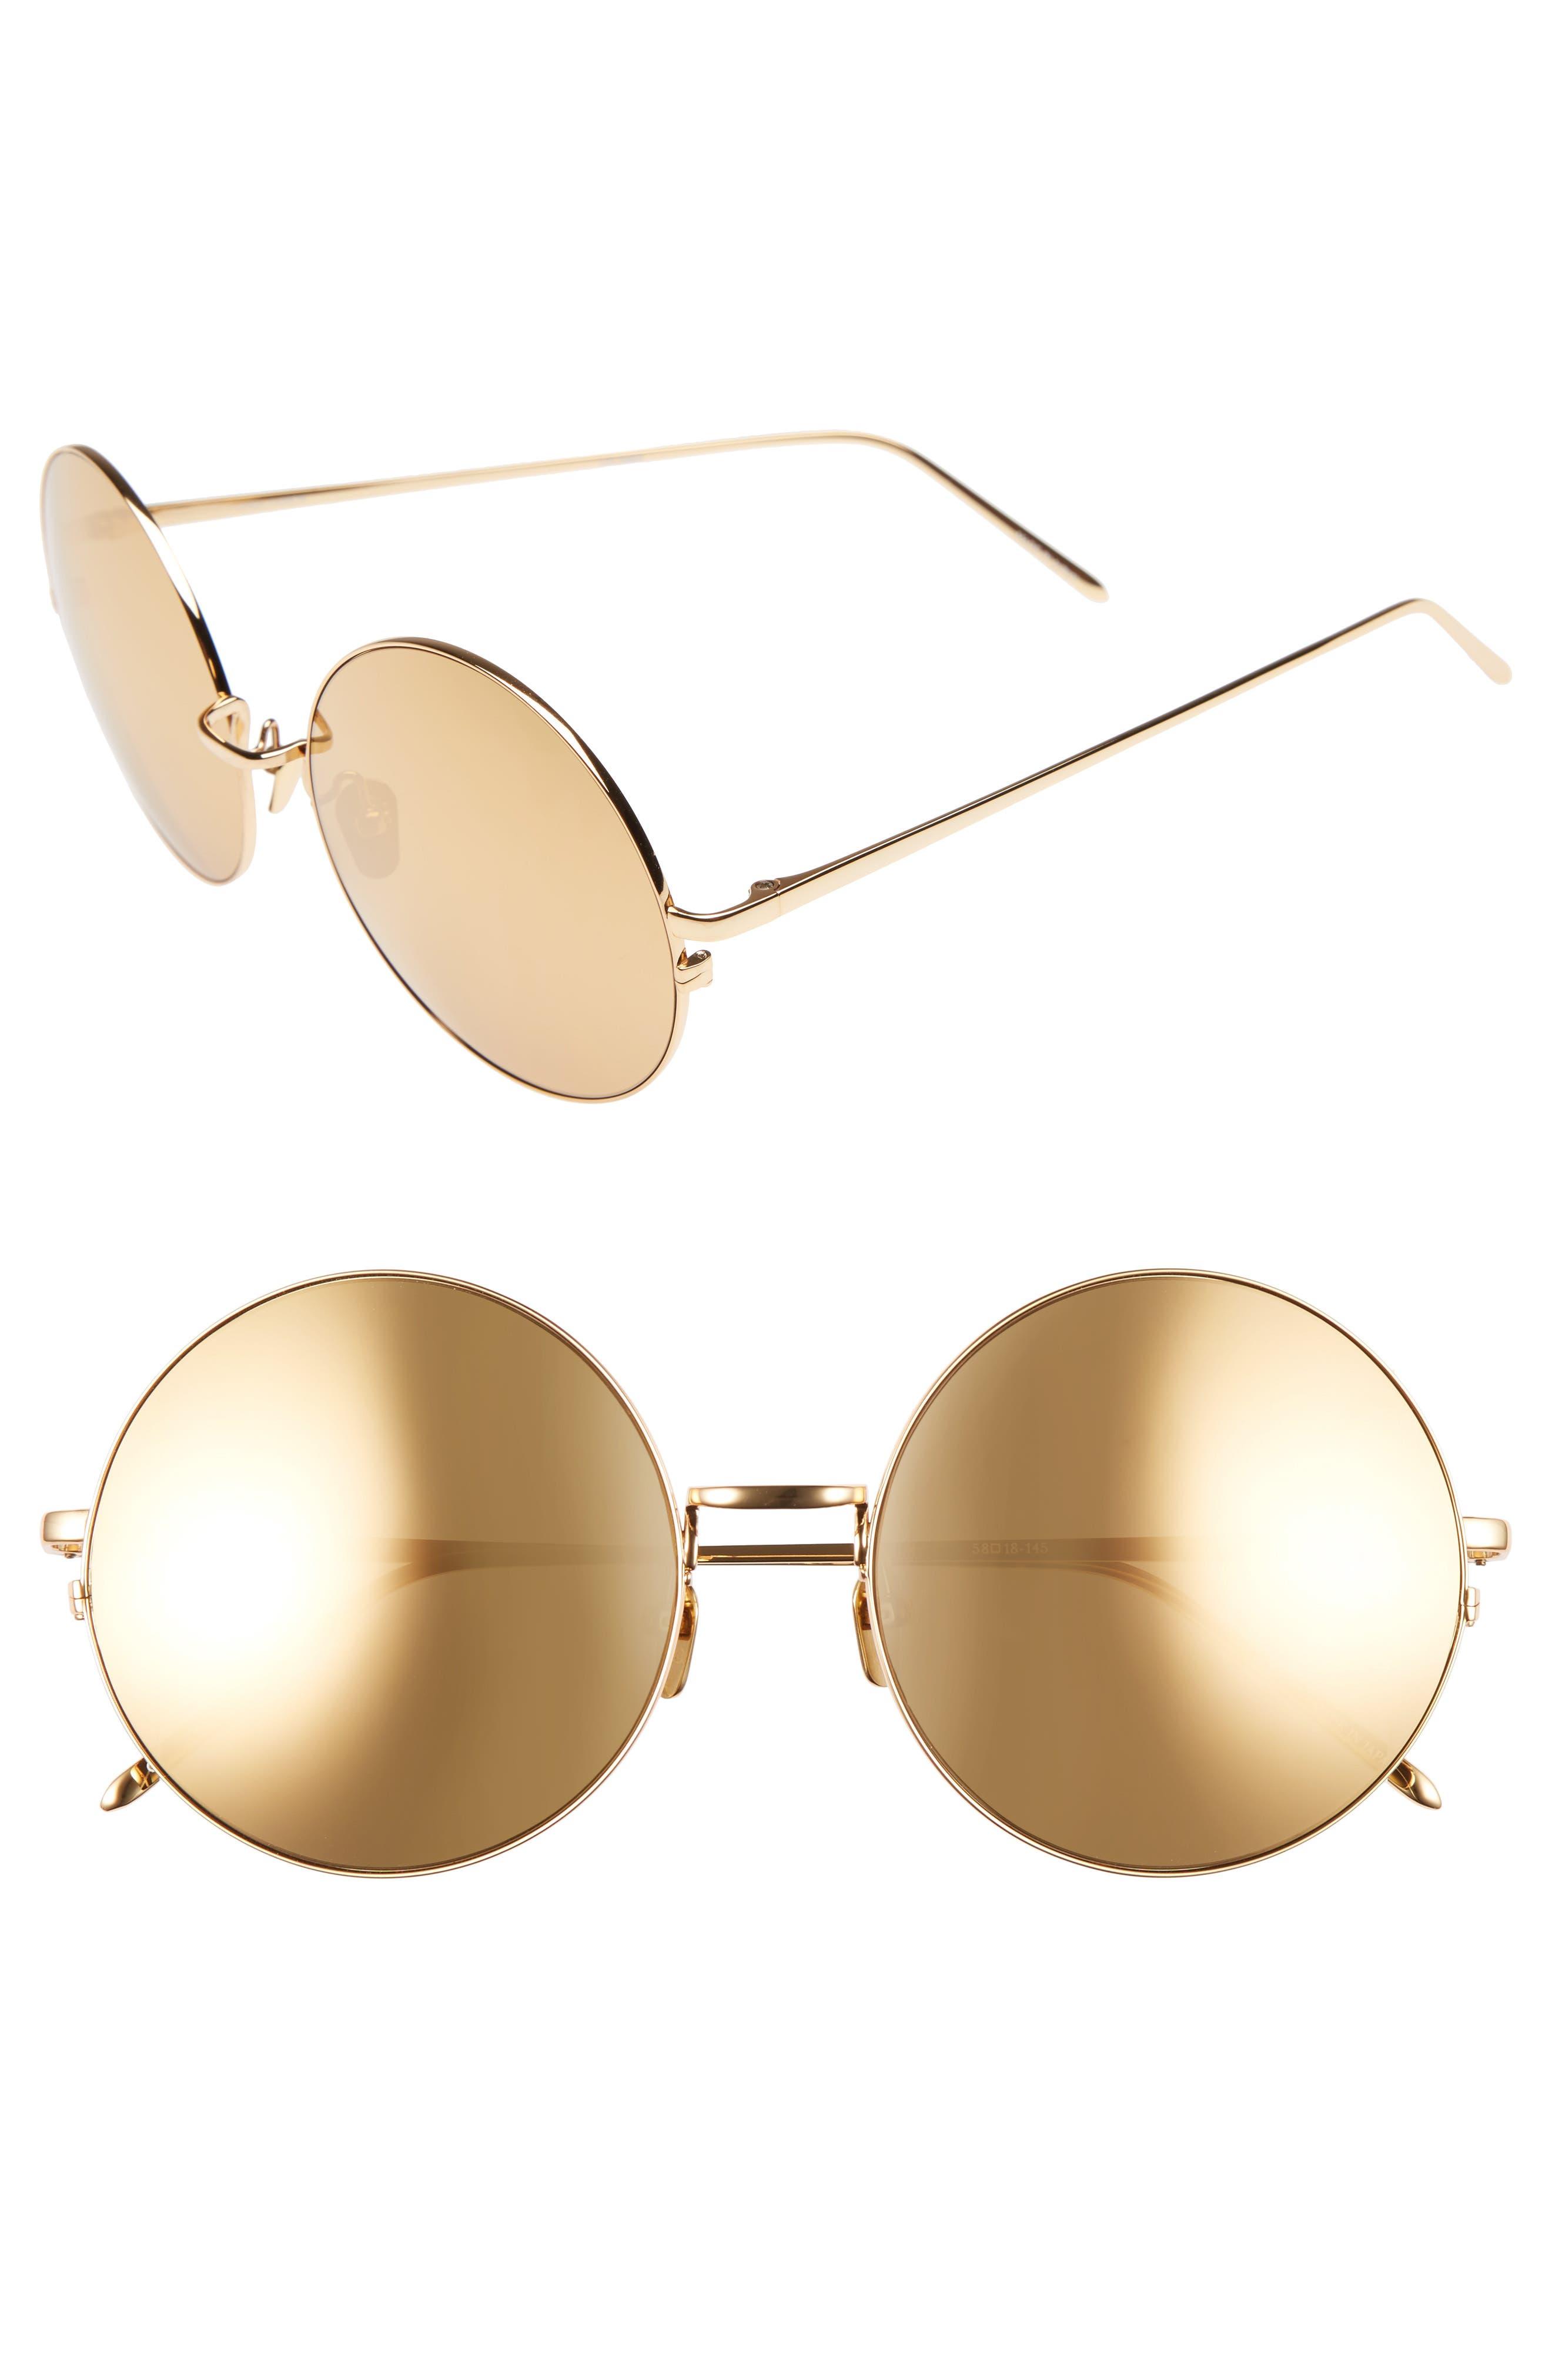 58mm 22 Karat Gold Trim Sunglasses,                             Main thumbnail 1, color,                             710